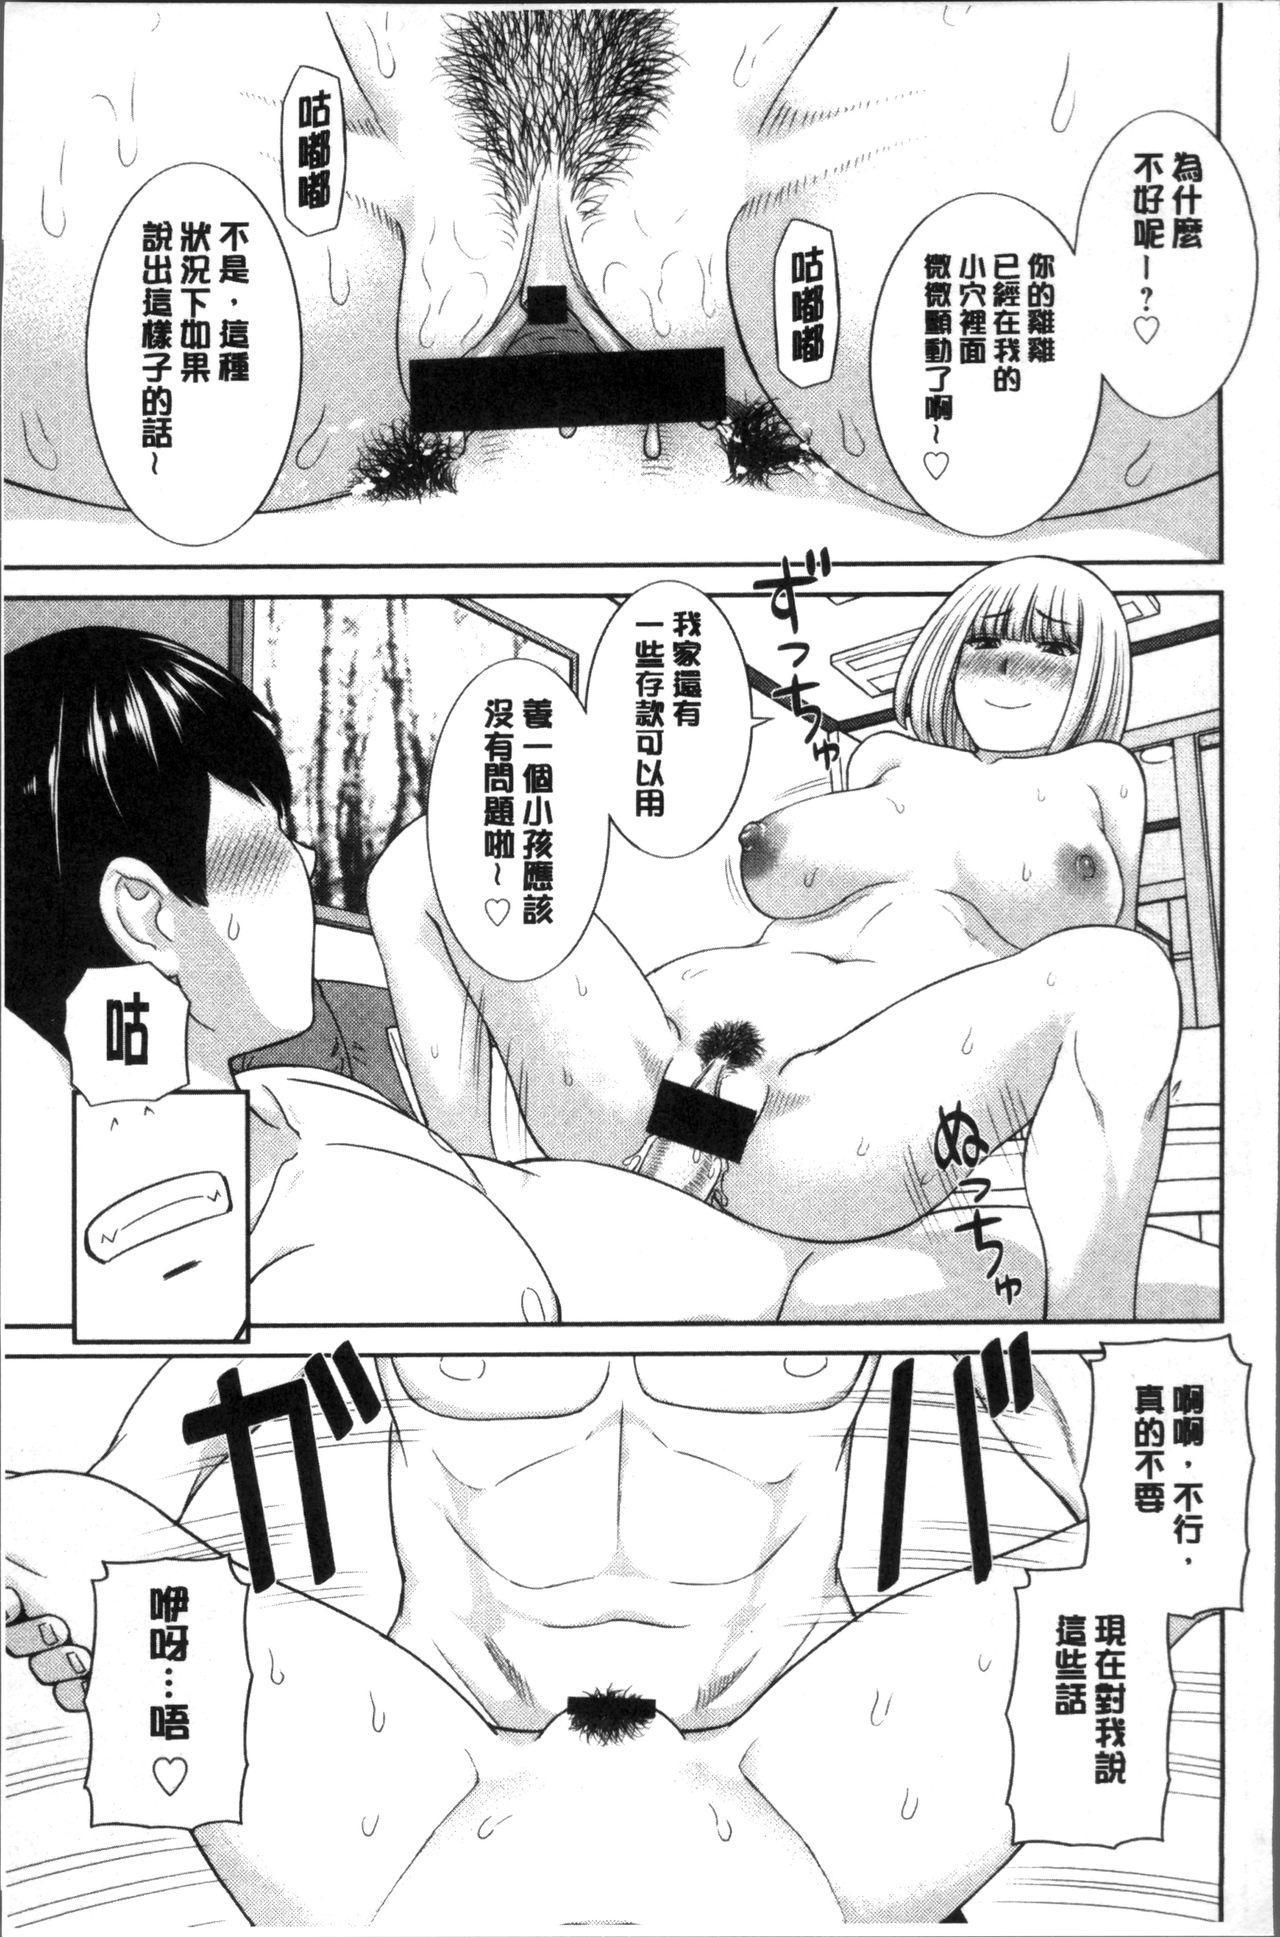 [Kawamori Misaki] Innyuu Shufu no Futei Ganbou - Oku-san to Kanojo to 2 | 淫乳主婦的不貞願望 和人妻也和女友❤2 [Chinese] 128